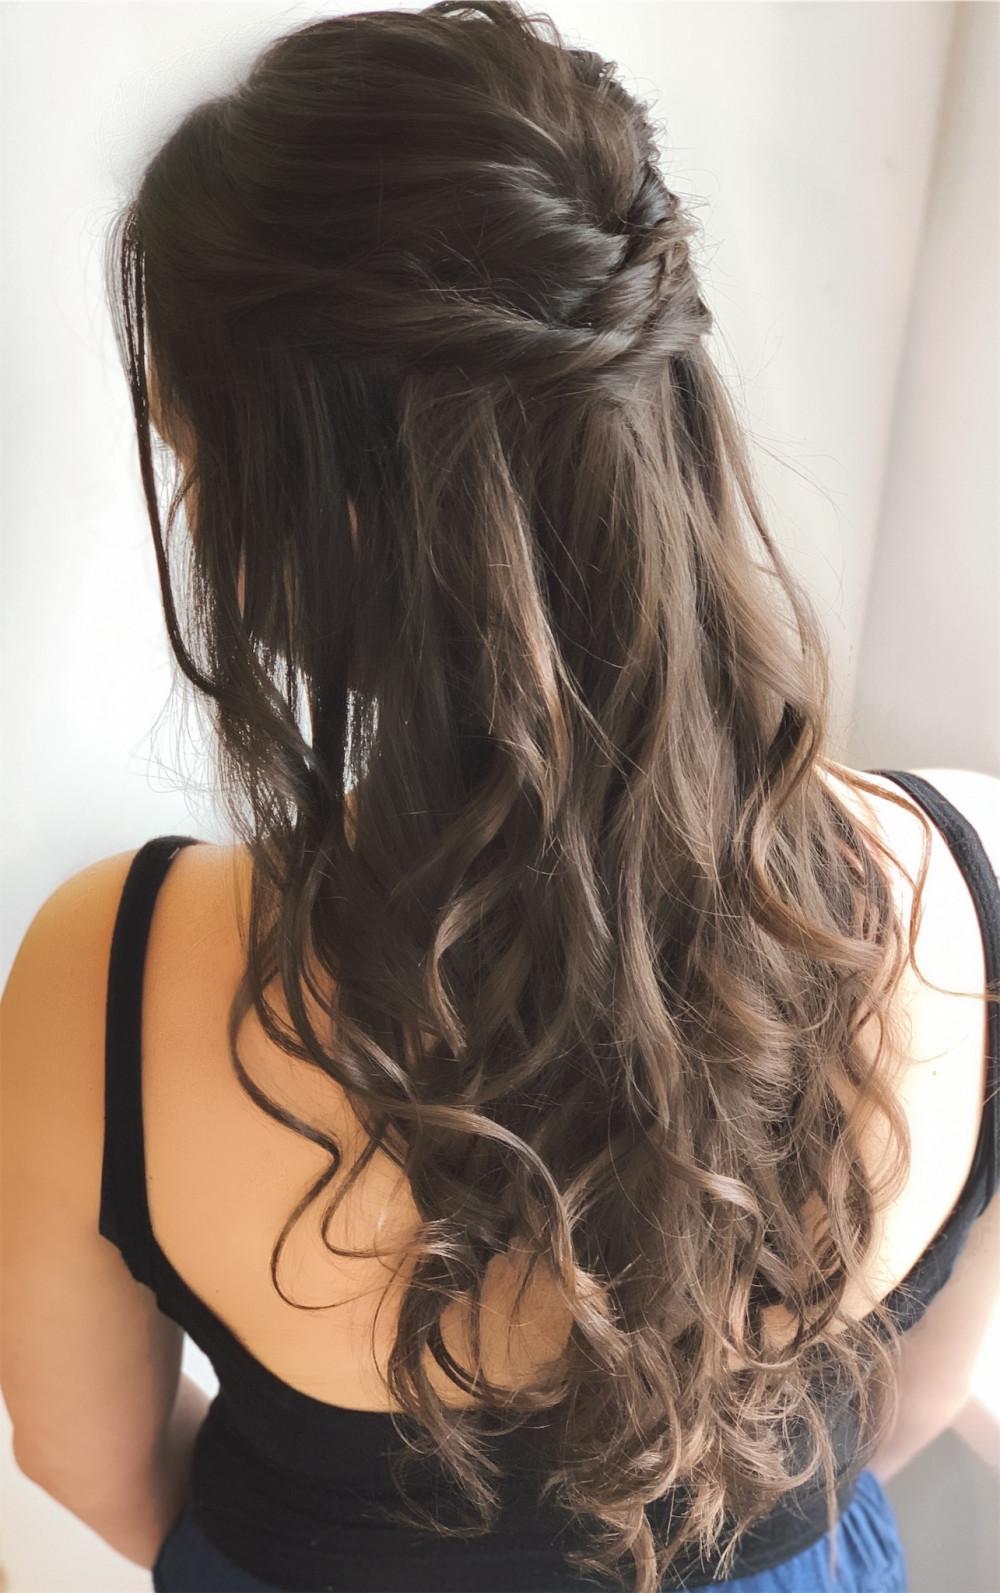 Half up Half down hairstyle - Make Me Bridal Artist: Abigail Blake.